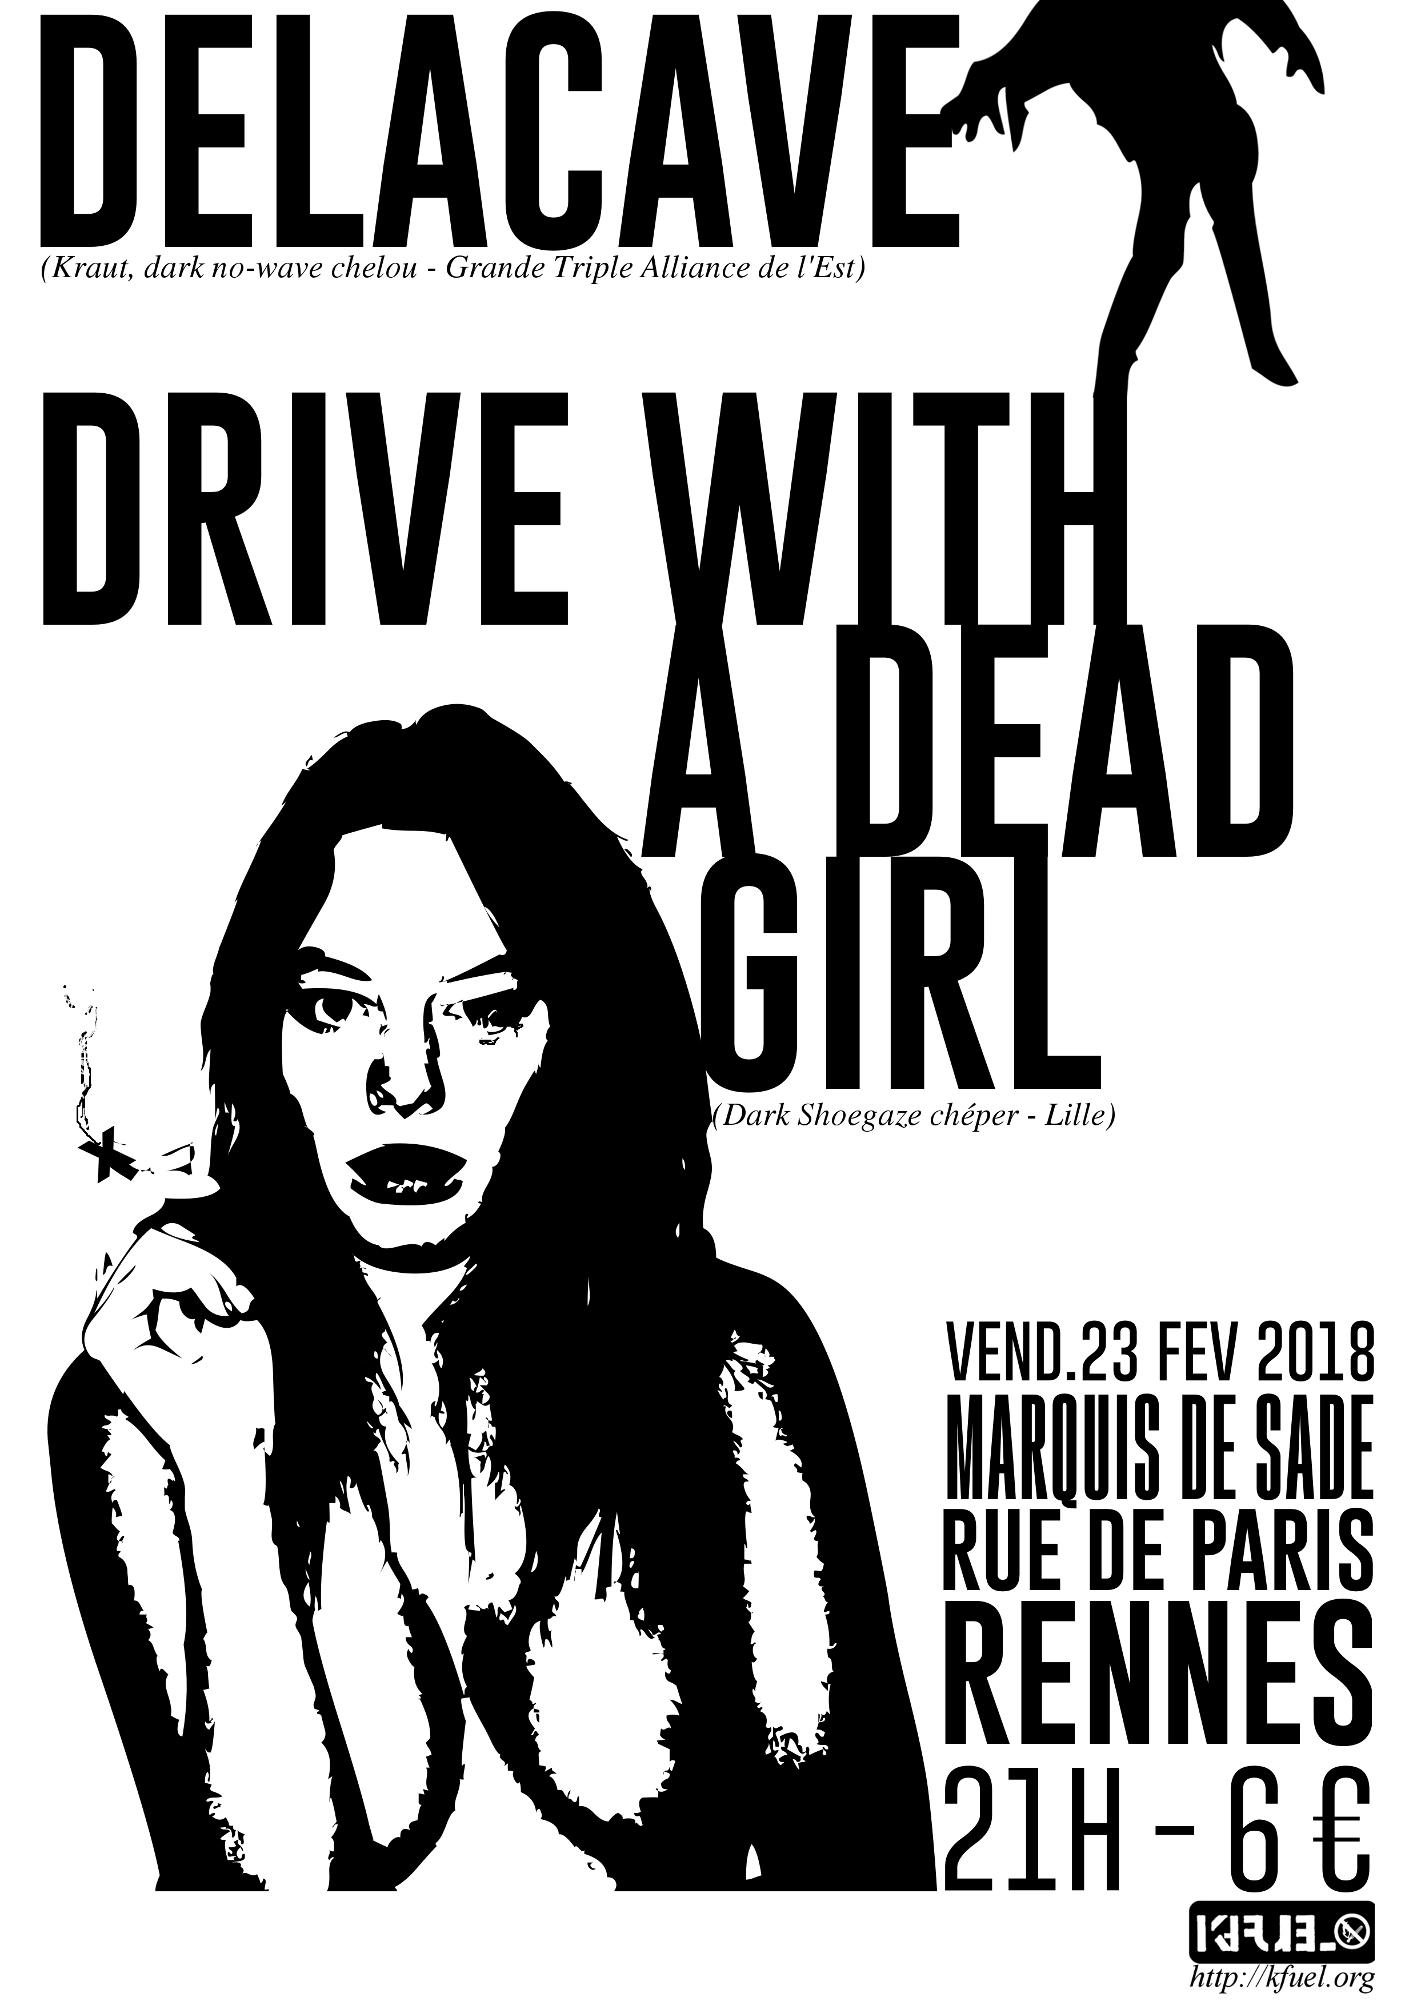 DELACAVE_DRIVE